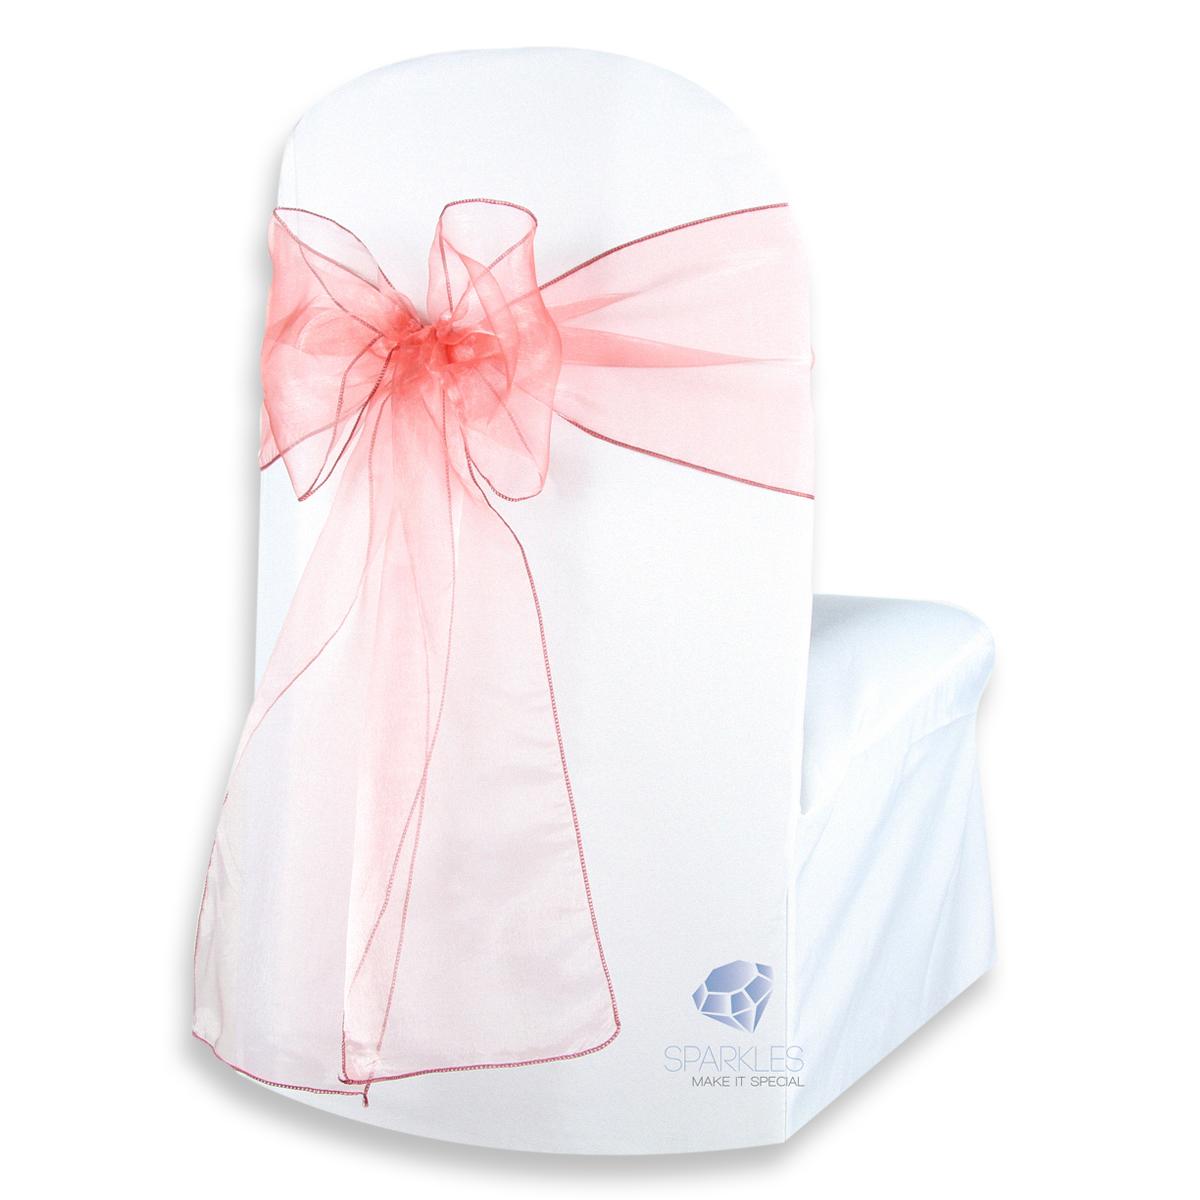 50 Pcs Organza Chair Cover Bow Sash 108x8 Wedding Party Banquet Reception